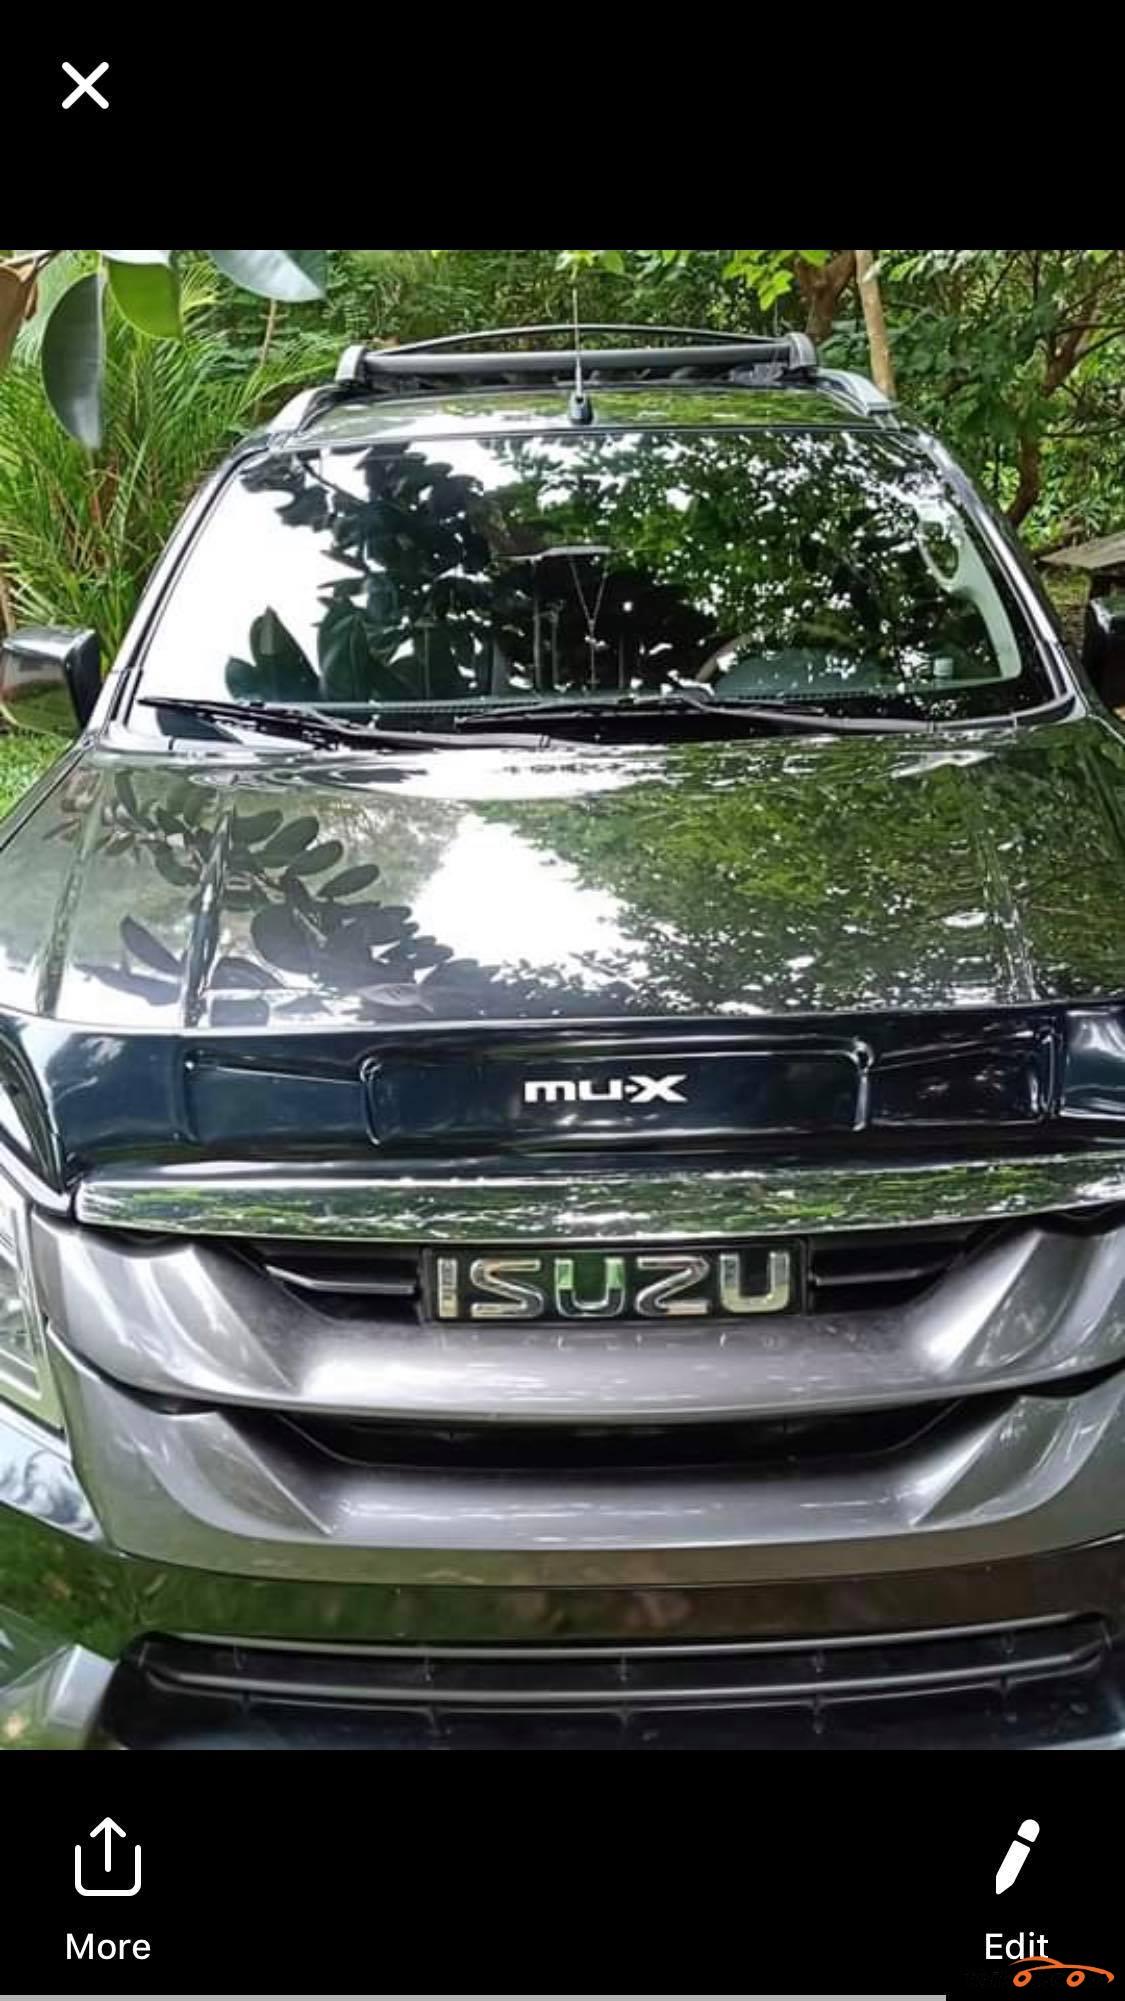 Isuzu Mu-X 2016 - 2